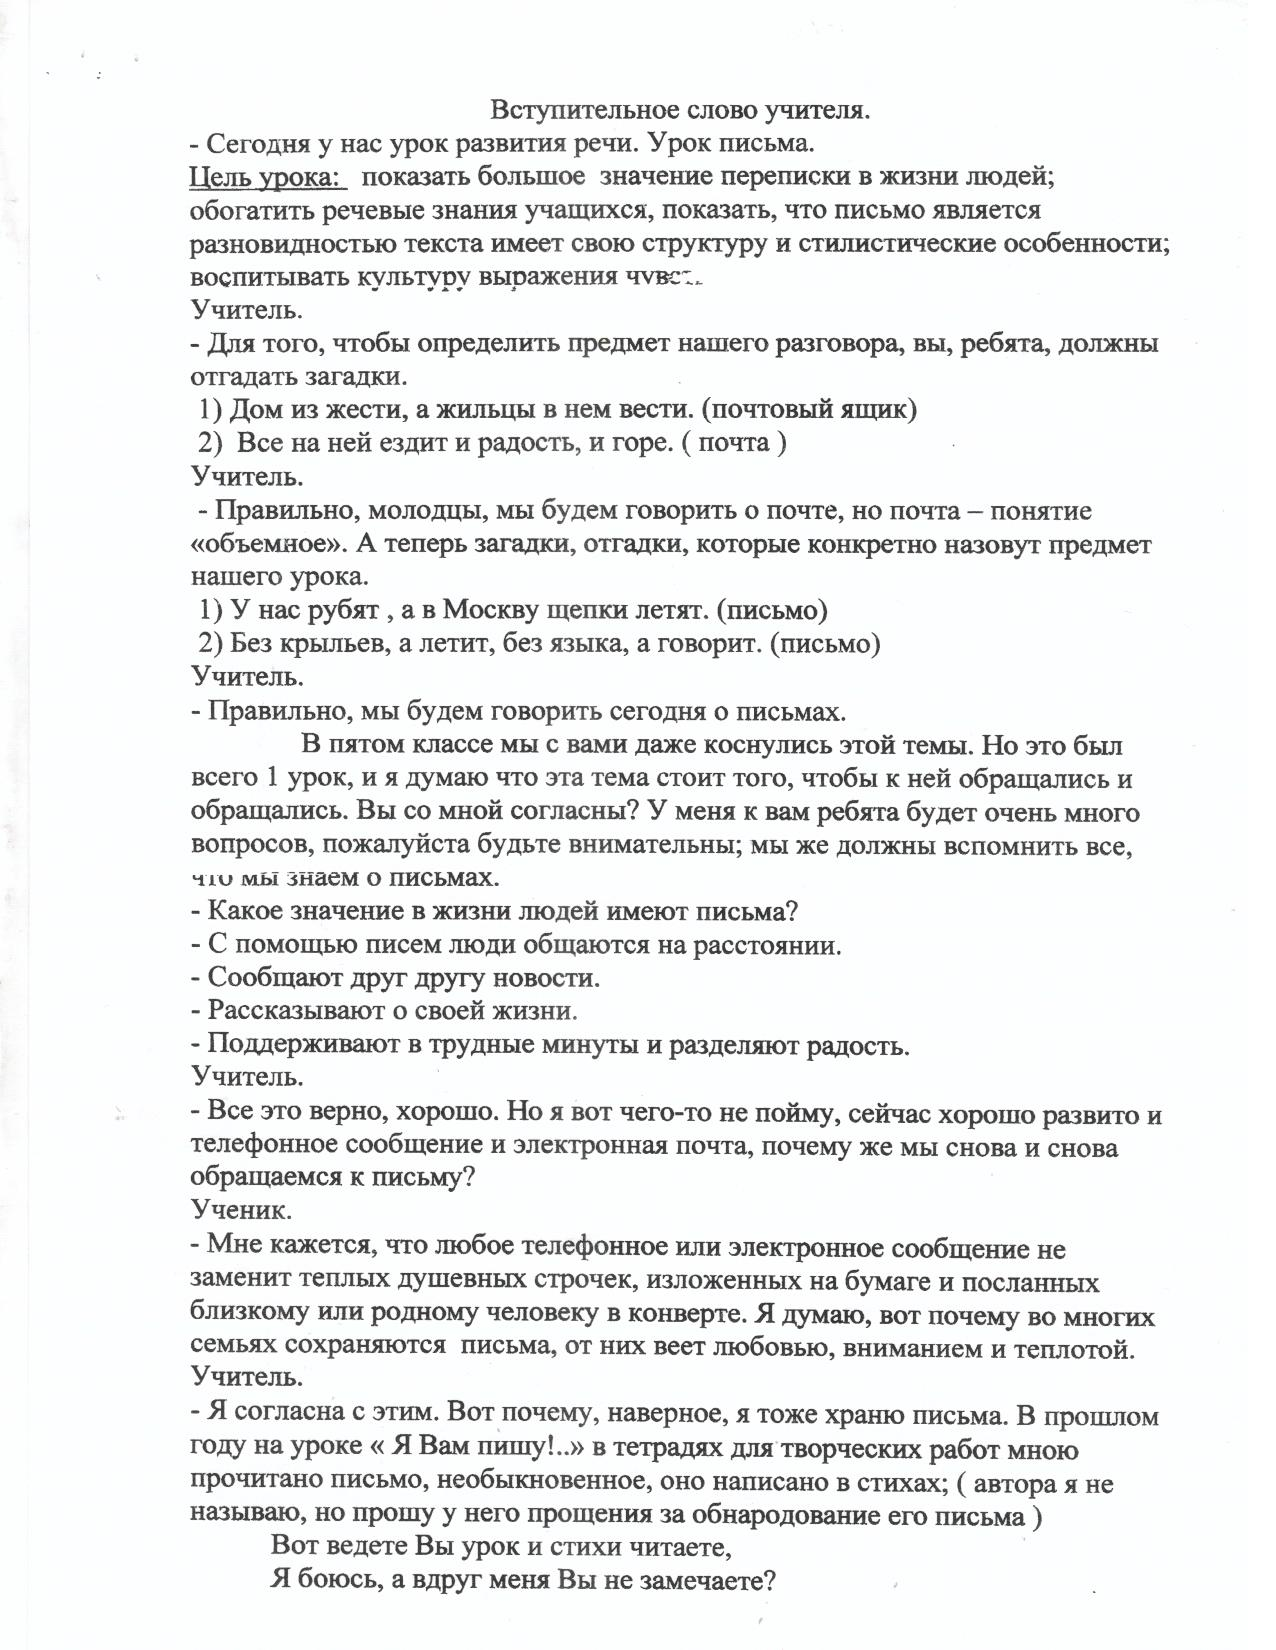 H:\сканер работ\Урок письма\стр2.jpg